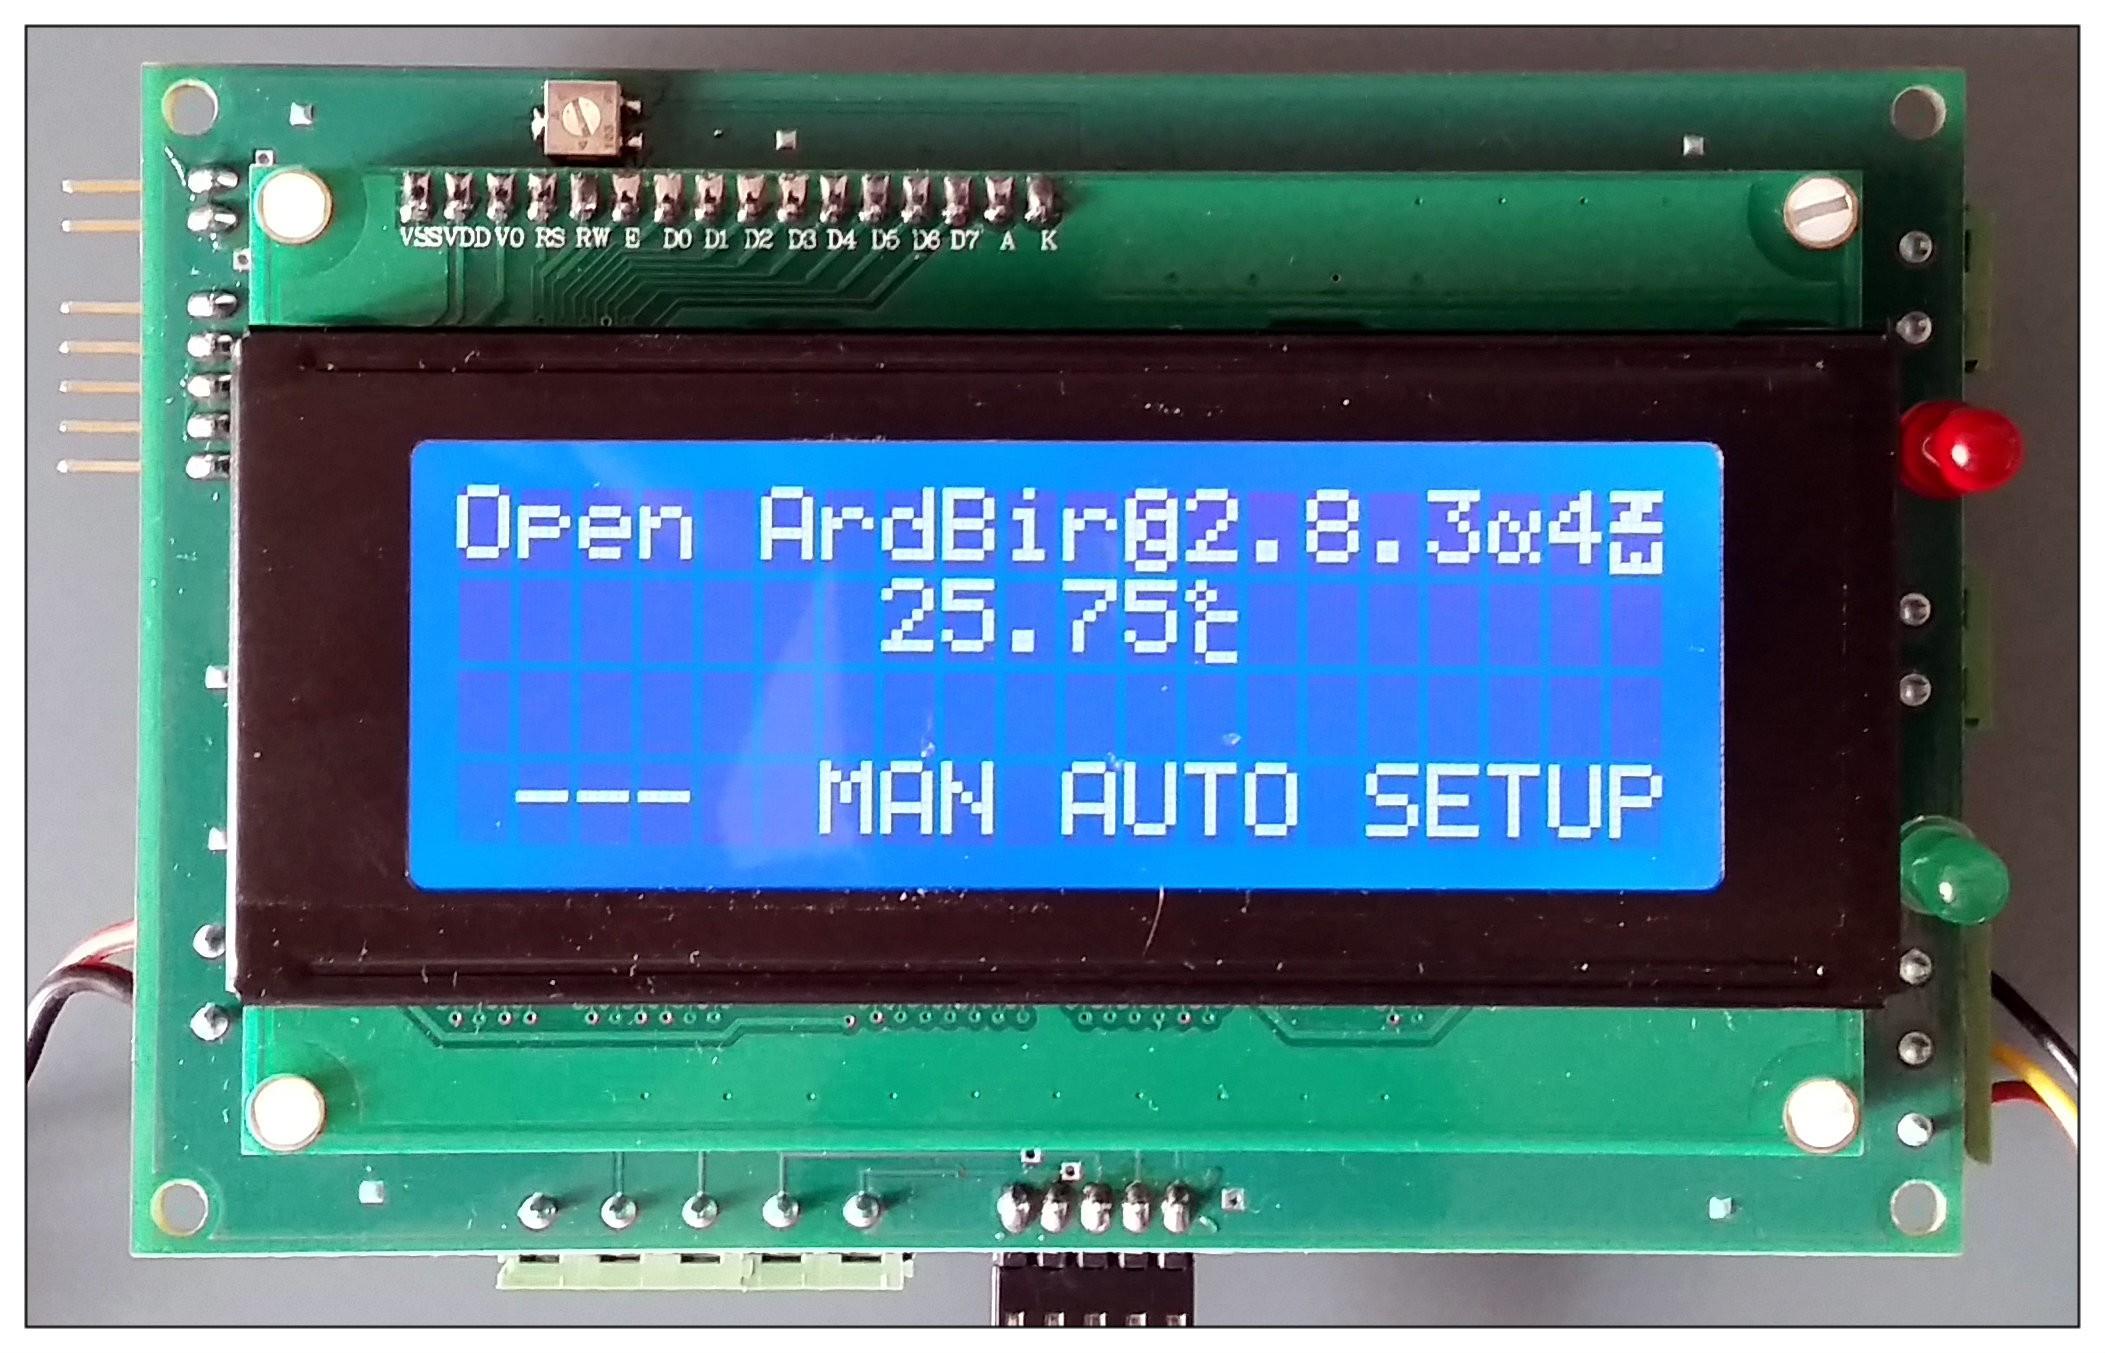 The perfect Beer with Arduino: OpenArdBir project 4